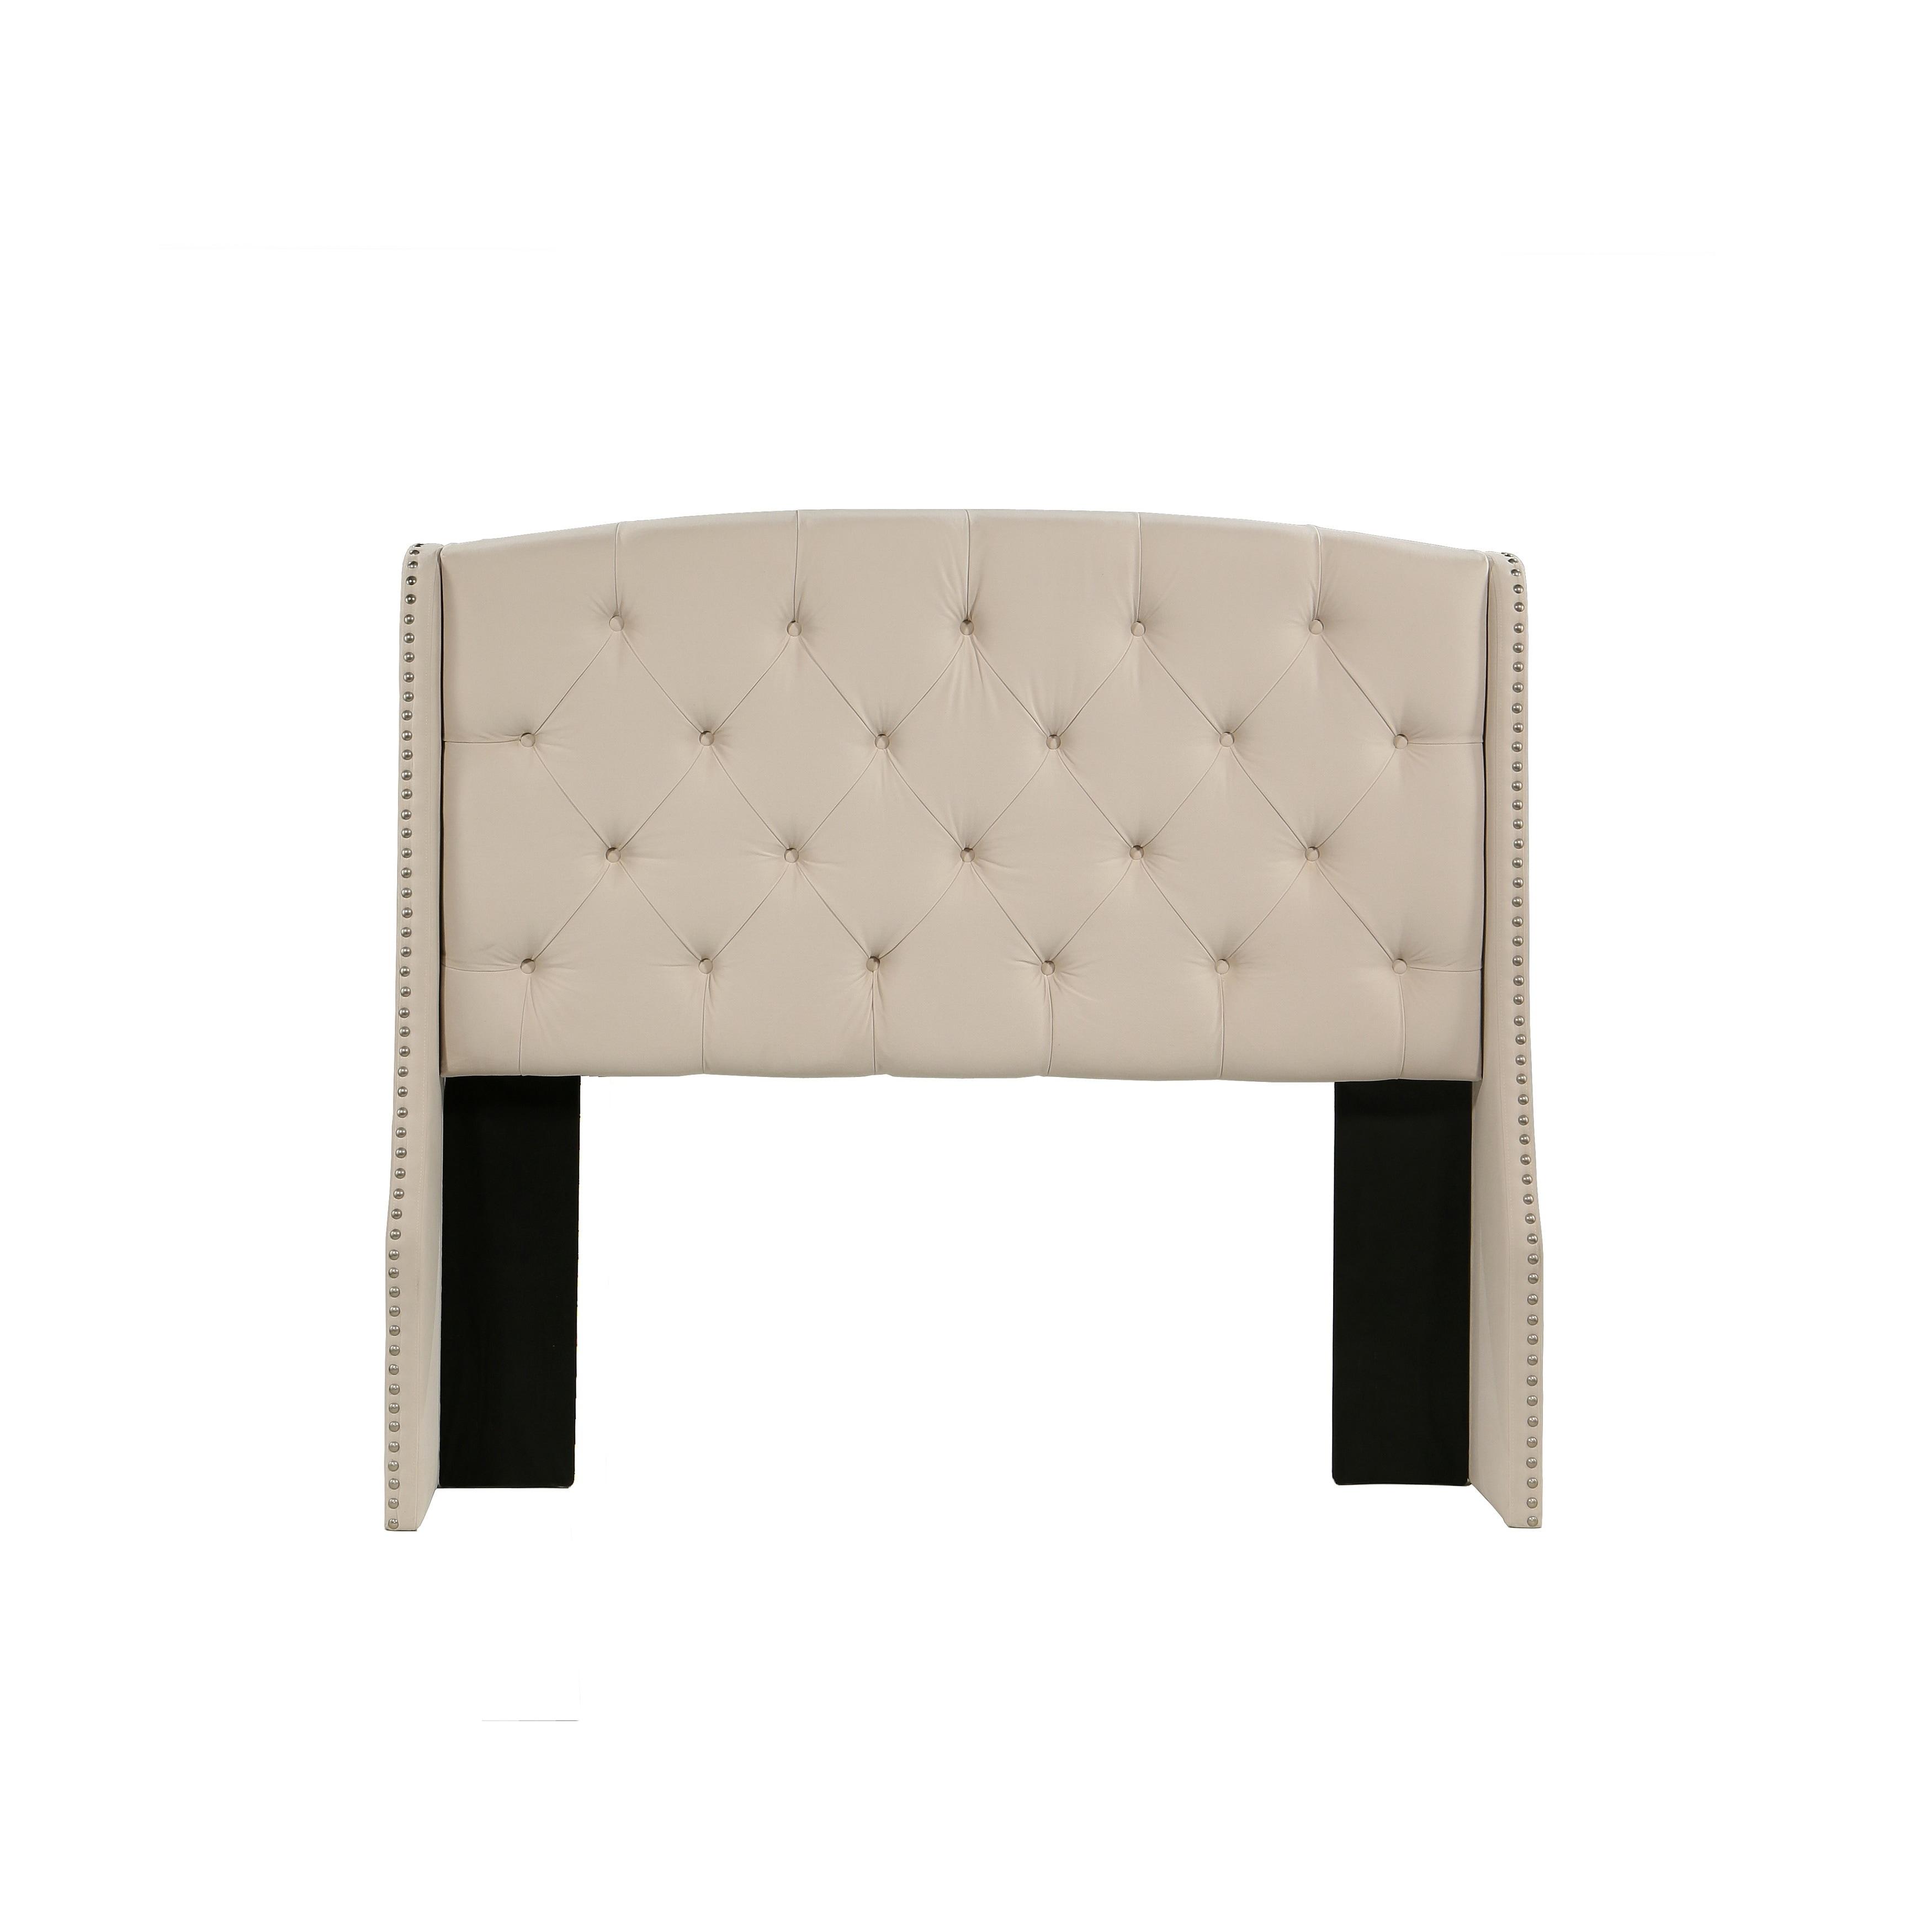 Republic Design House Peyton Ivory Tufted Upholstered Hea...